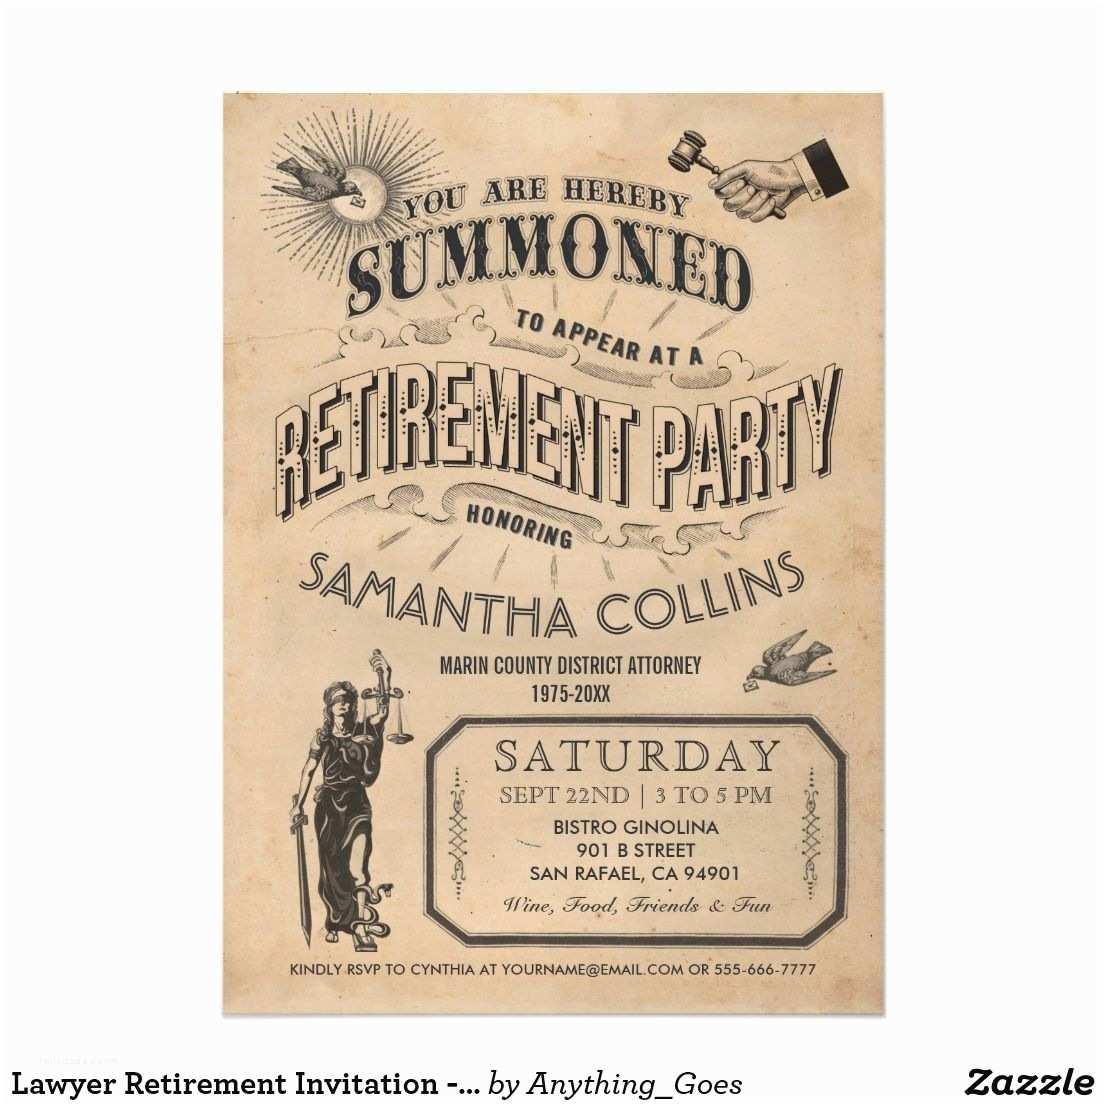 Retirement Invitations Lawyer Retirement Invitation Party Vintage Retro